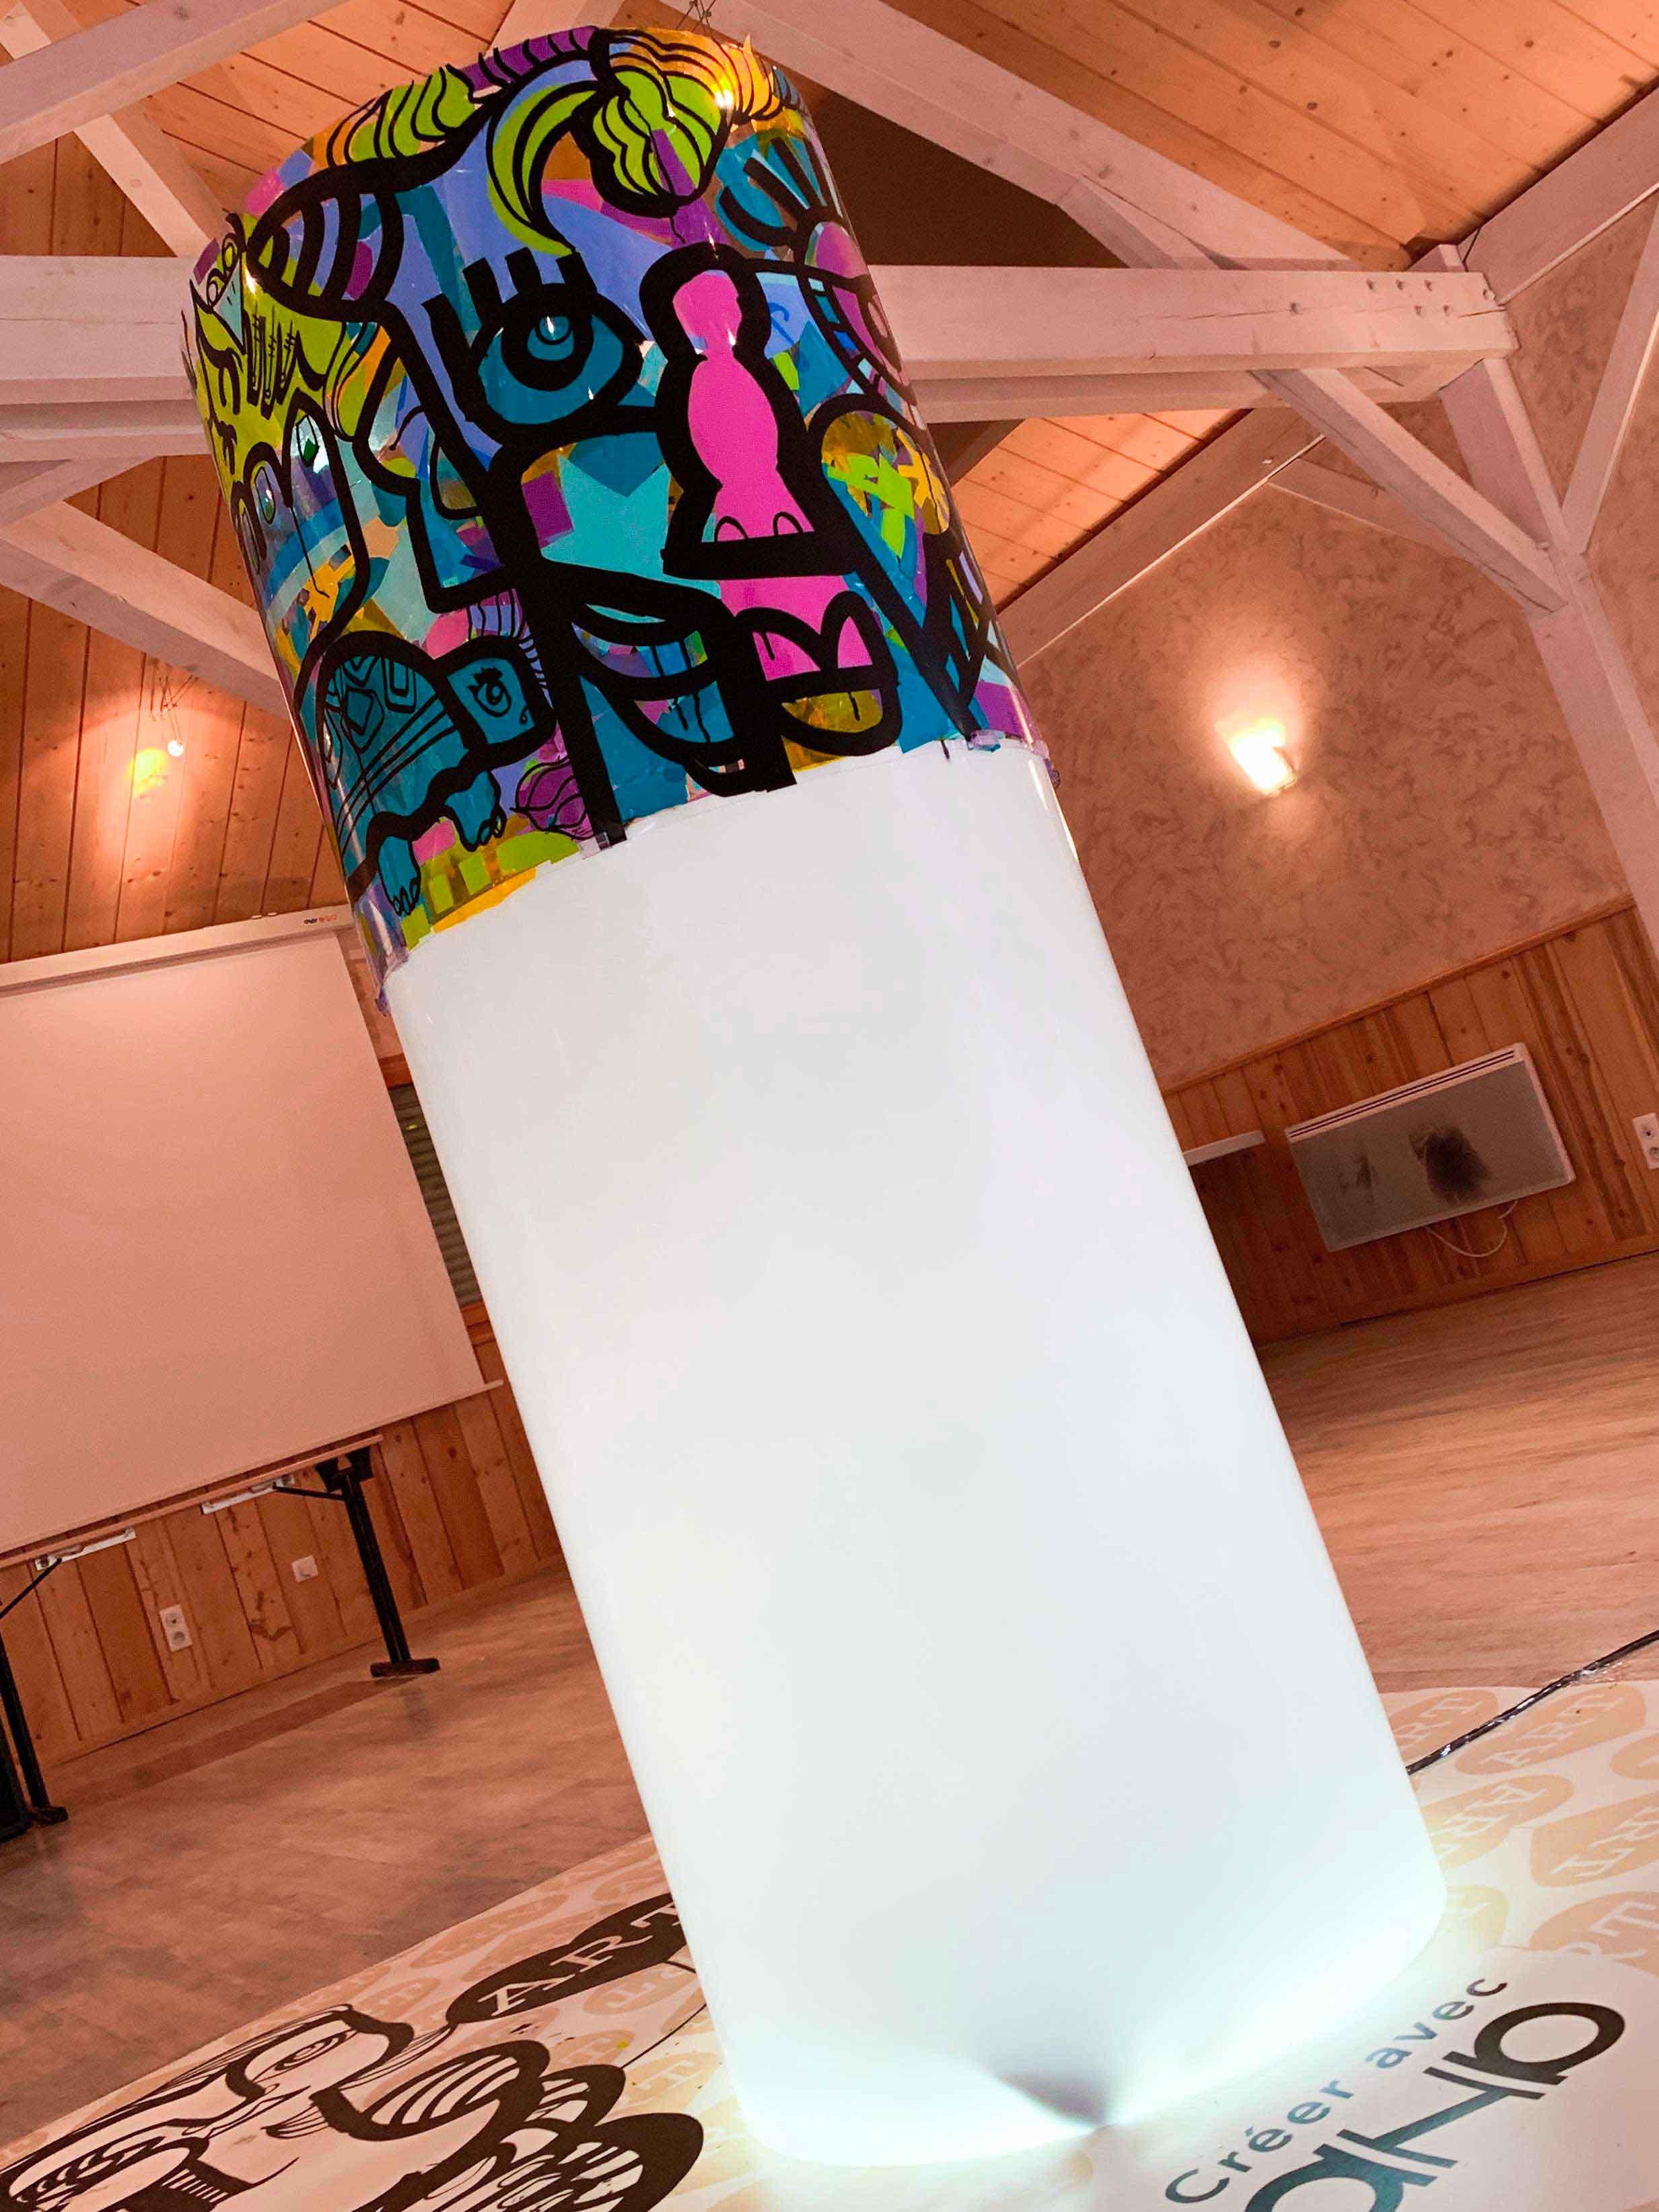 Totem plexi art Tube Néon aNa My Art Box en animation Team building Jura pour l'agence AMT organisation